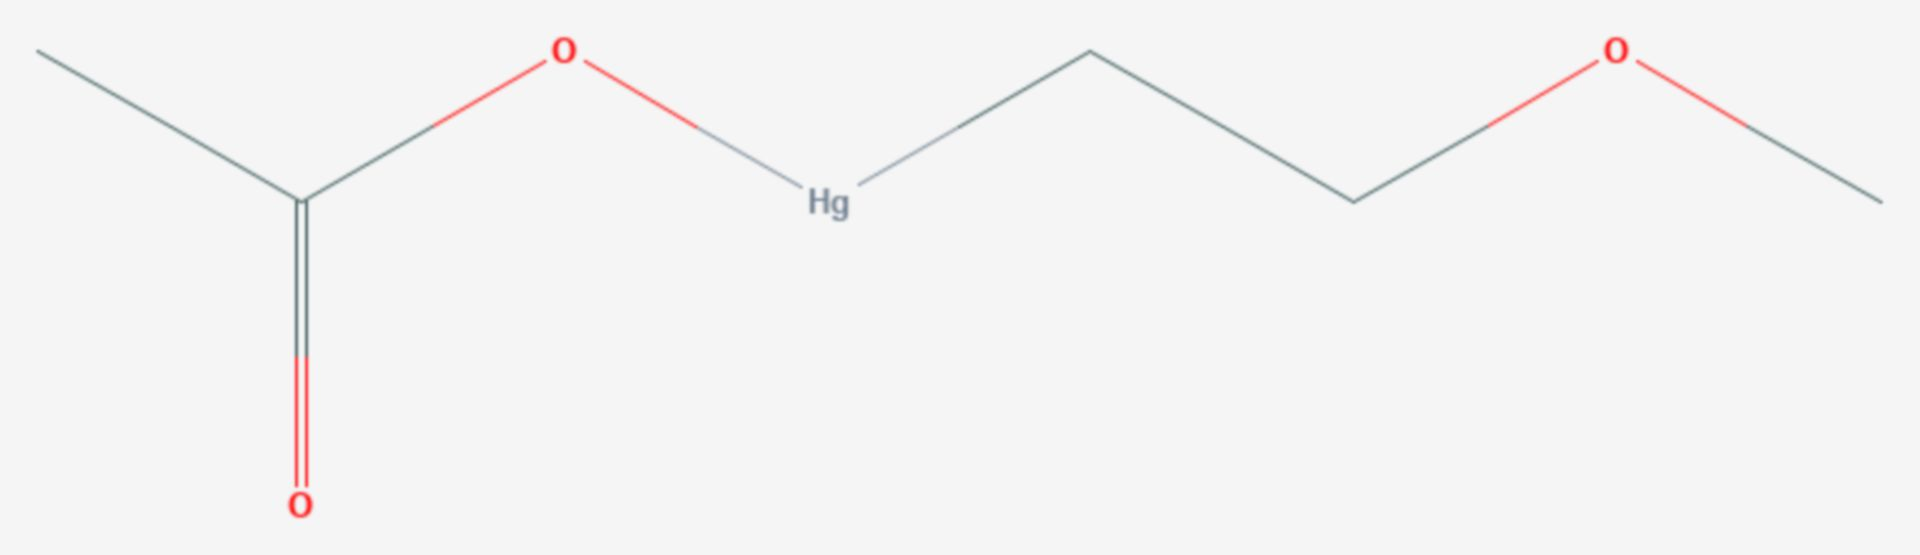 2-Methoxyethylquecksilberacetat (Strukturformel)